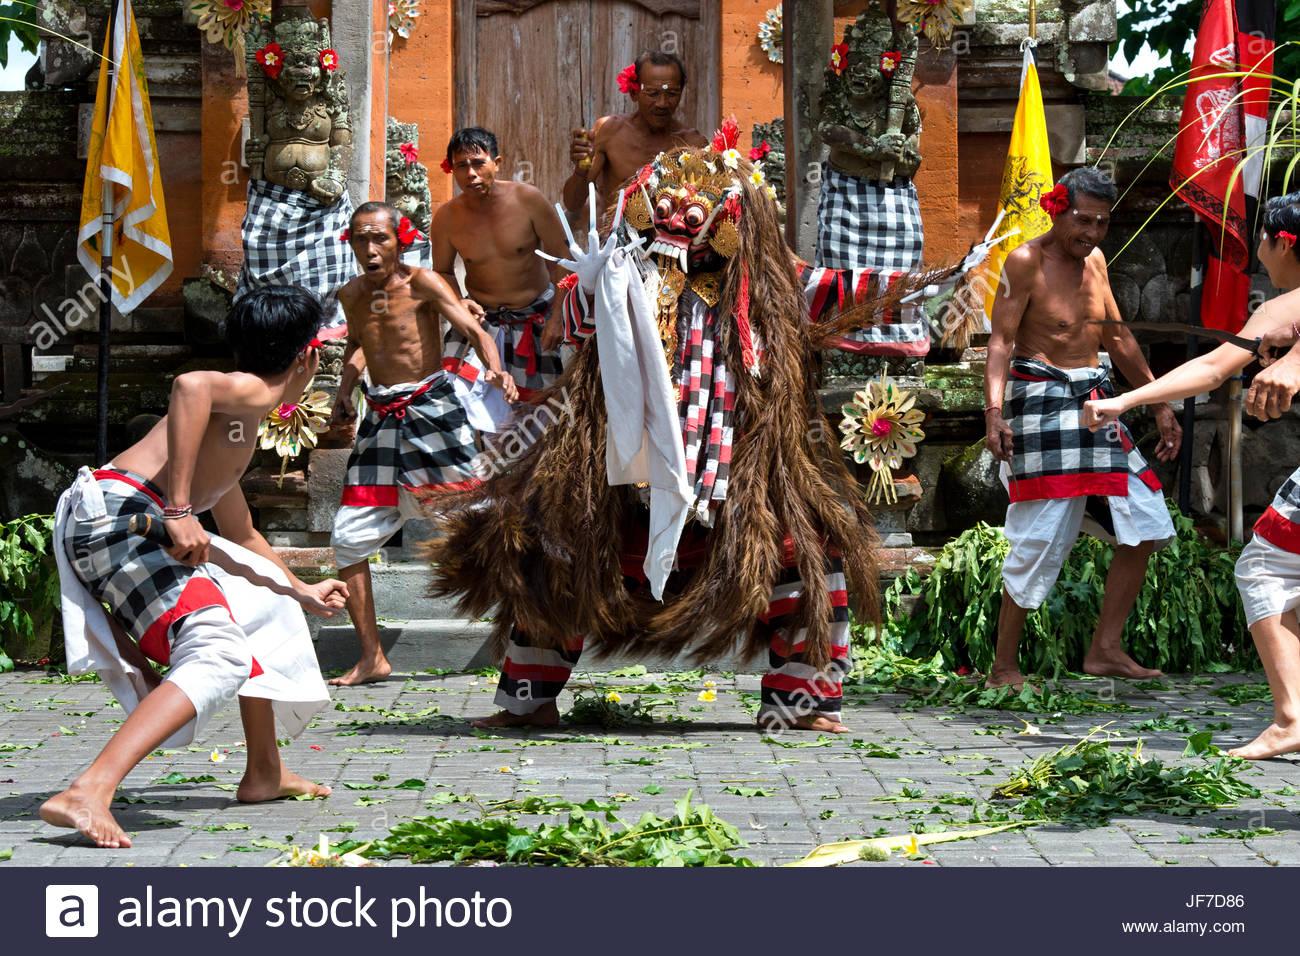 indonesia bali ubud barong and keris dance in the village of stock photo alamy https www alamy com stock photo indonesia bali ubud barong and keris dance in the village of batubulan 147066870 html